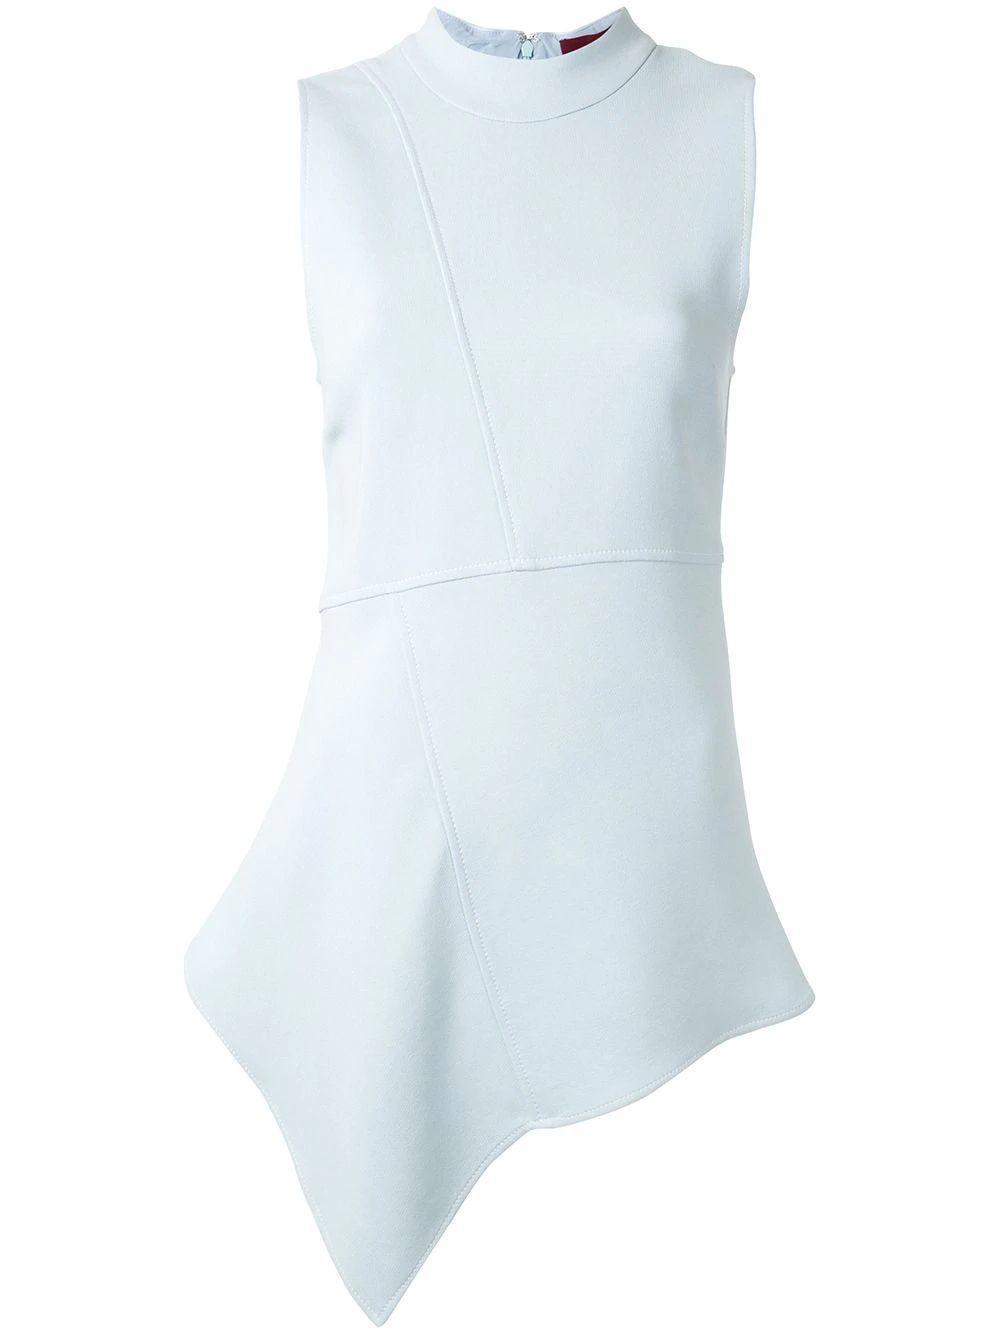 Bianca Sleeve Less Crepe Peplum Top Item # 15LQ3099-7542